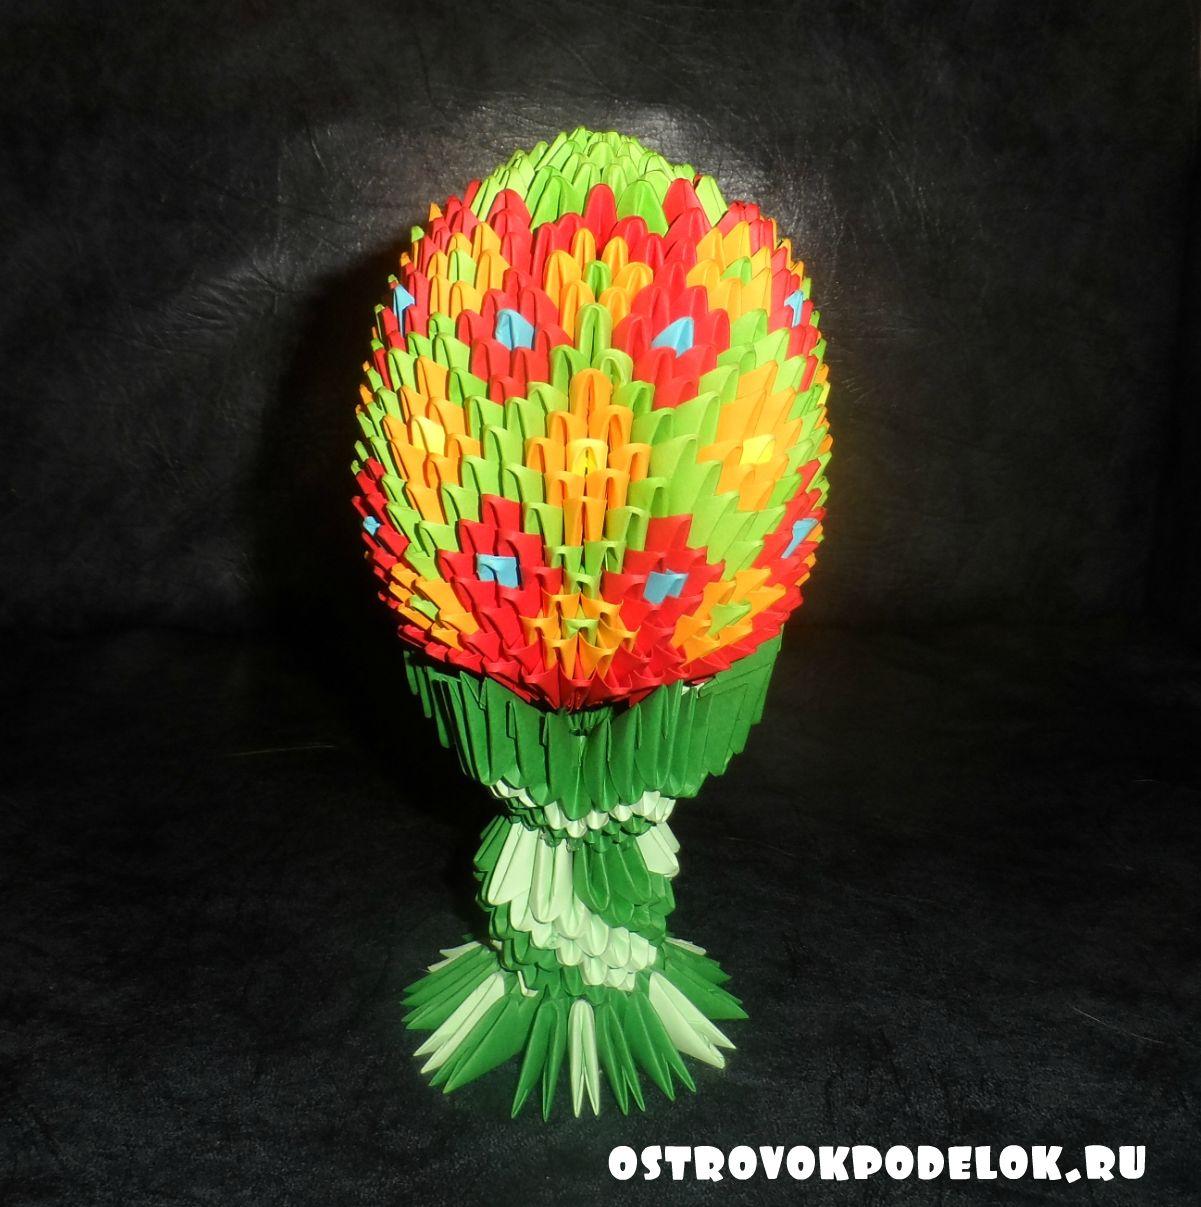 корзина для цветов. модульное оригами, схема.